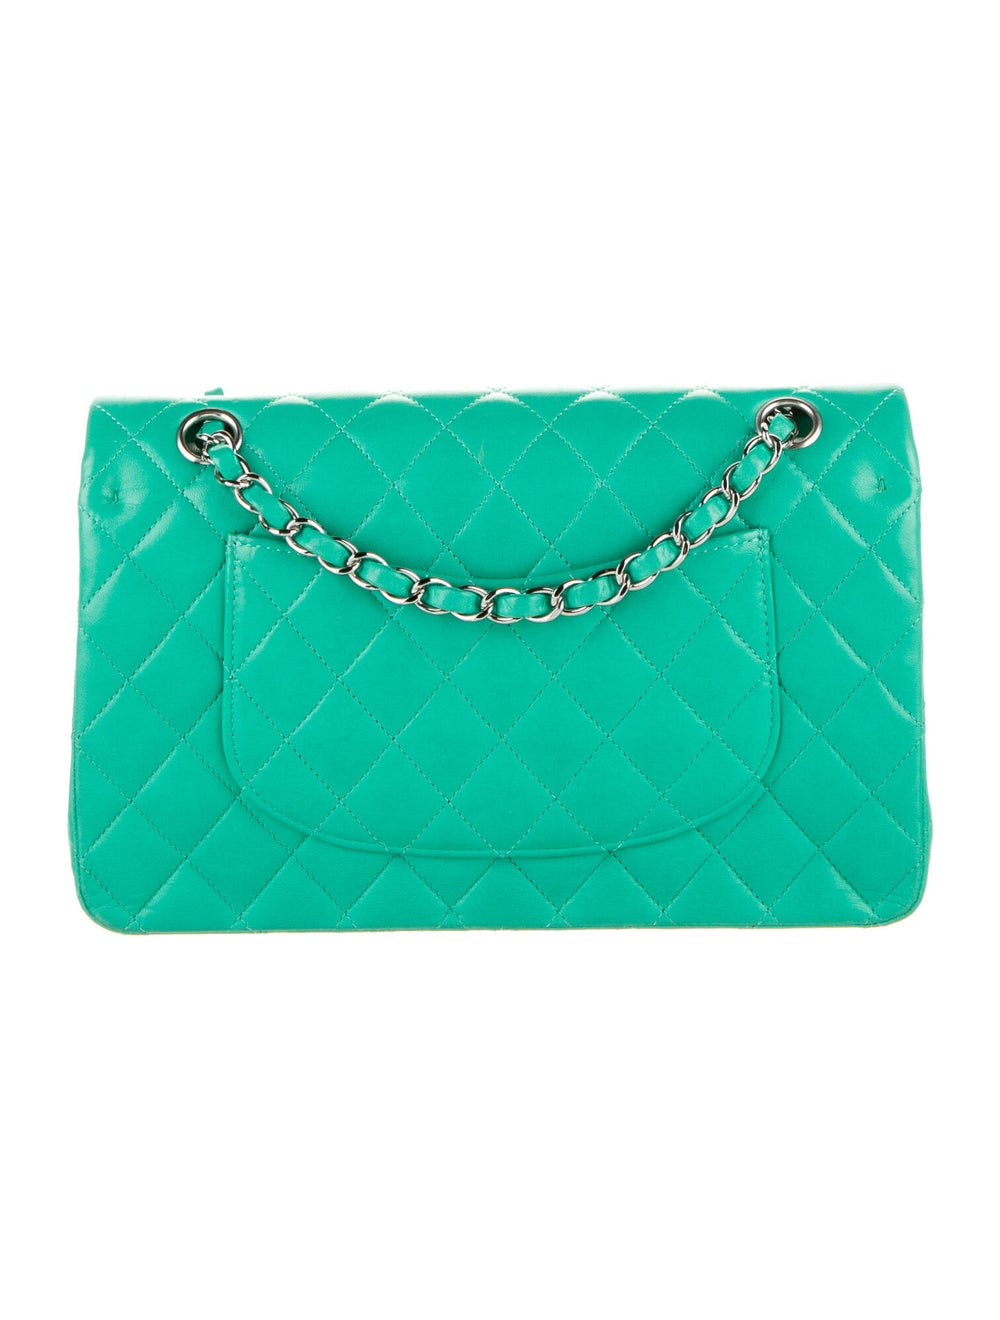 Chanel Classic Medium Double Flap Bag Blue - image 4